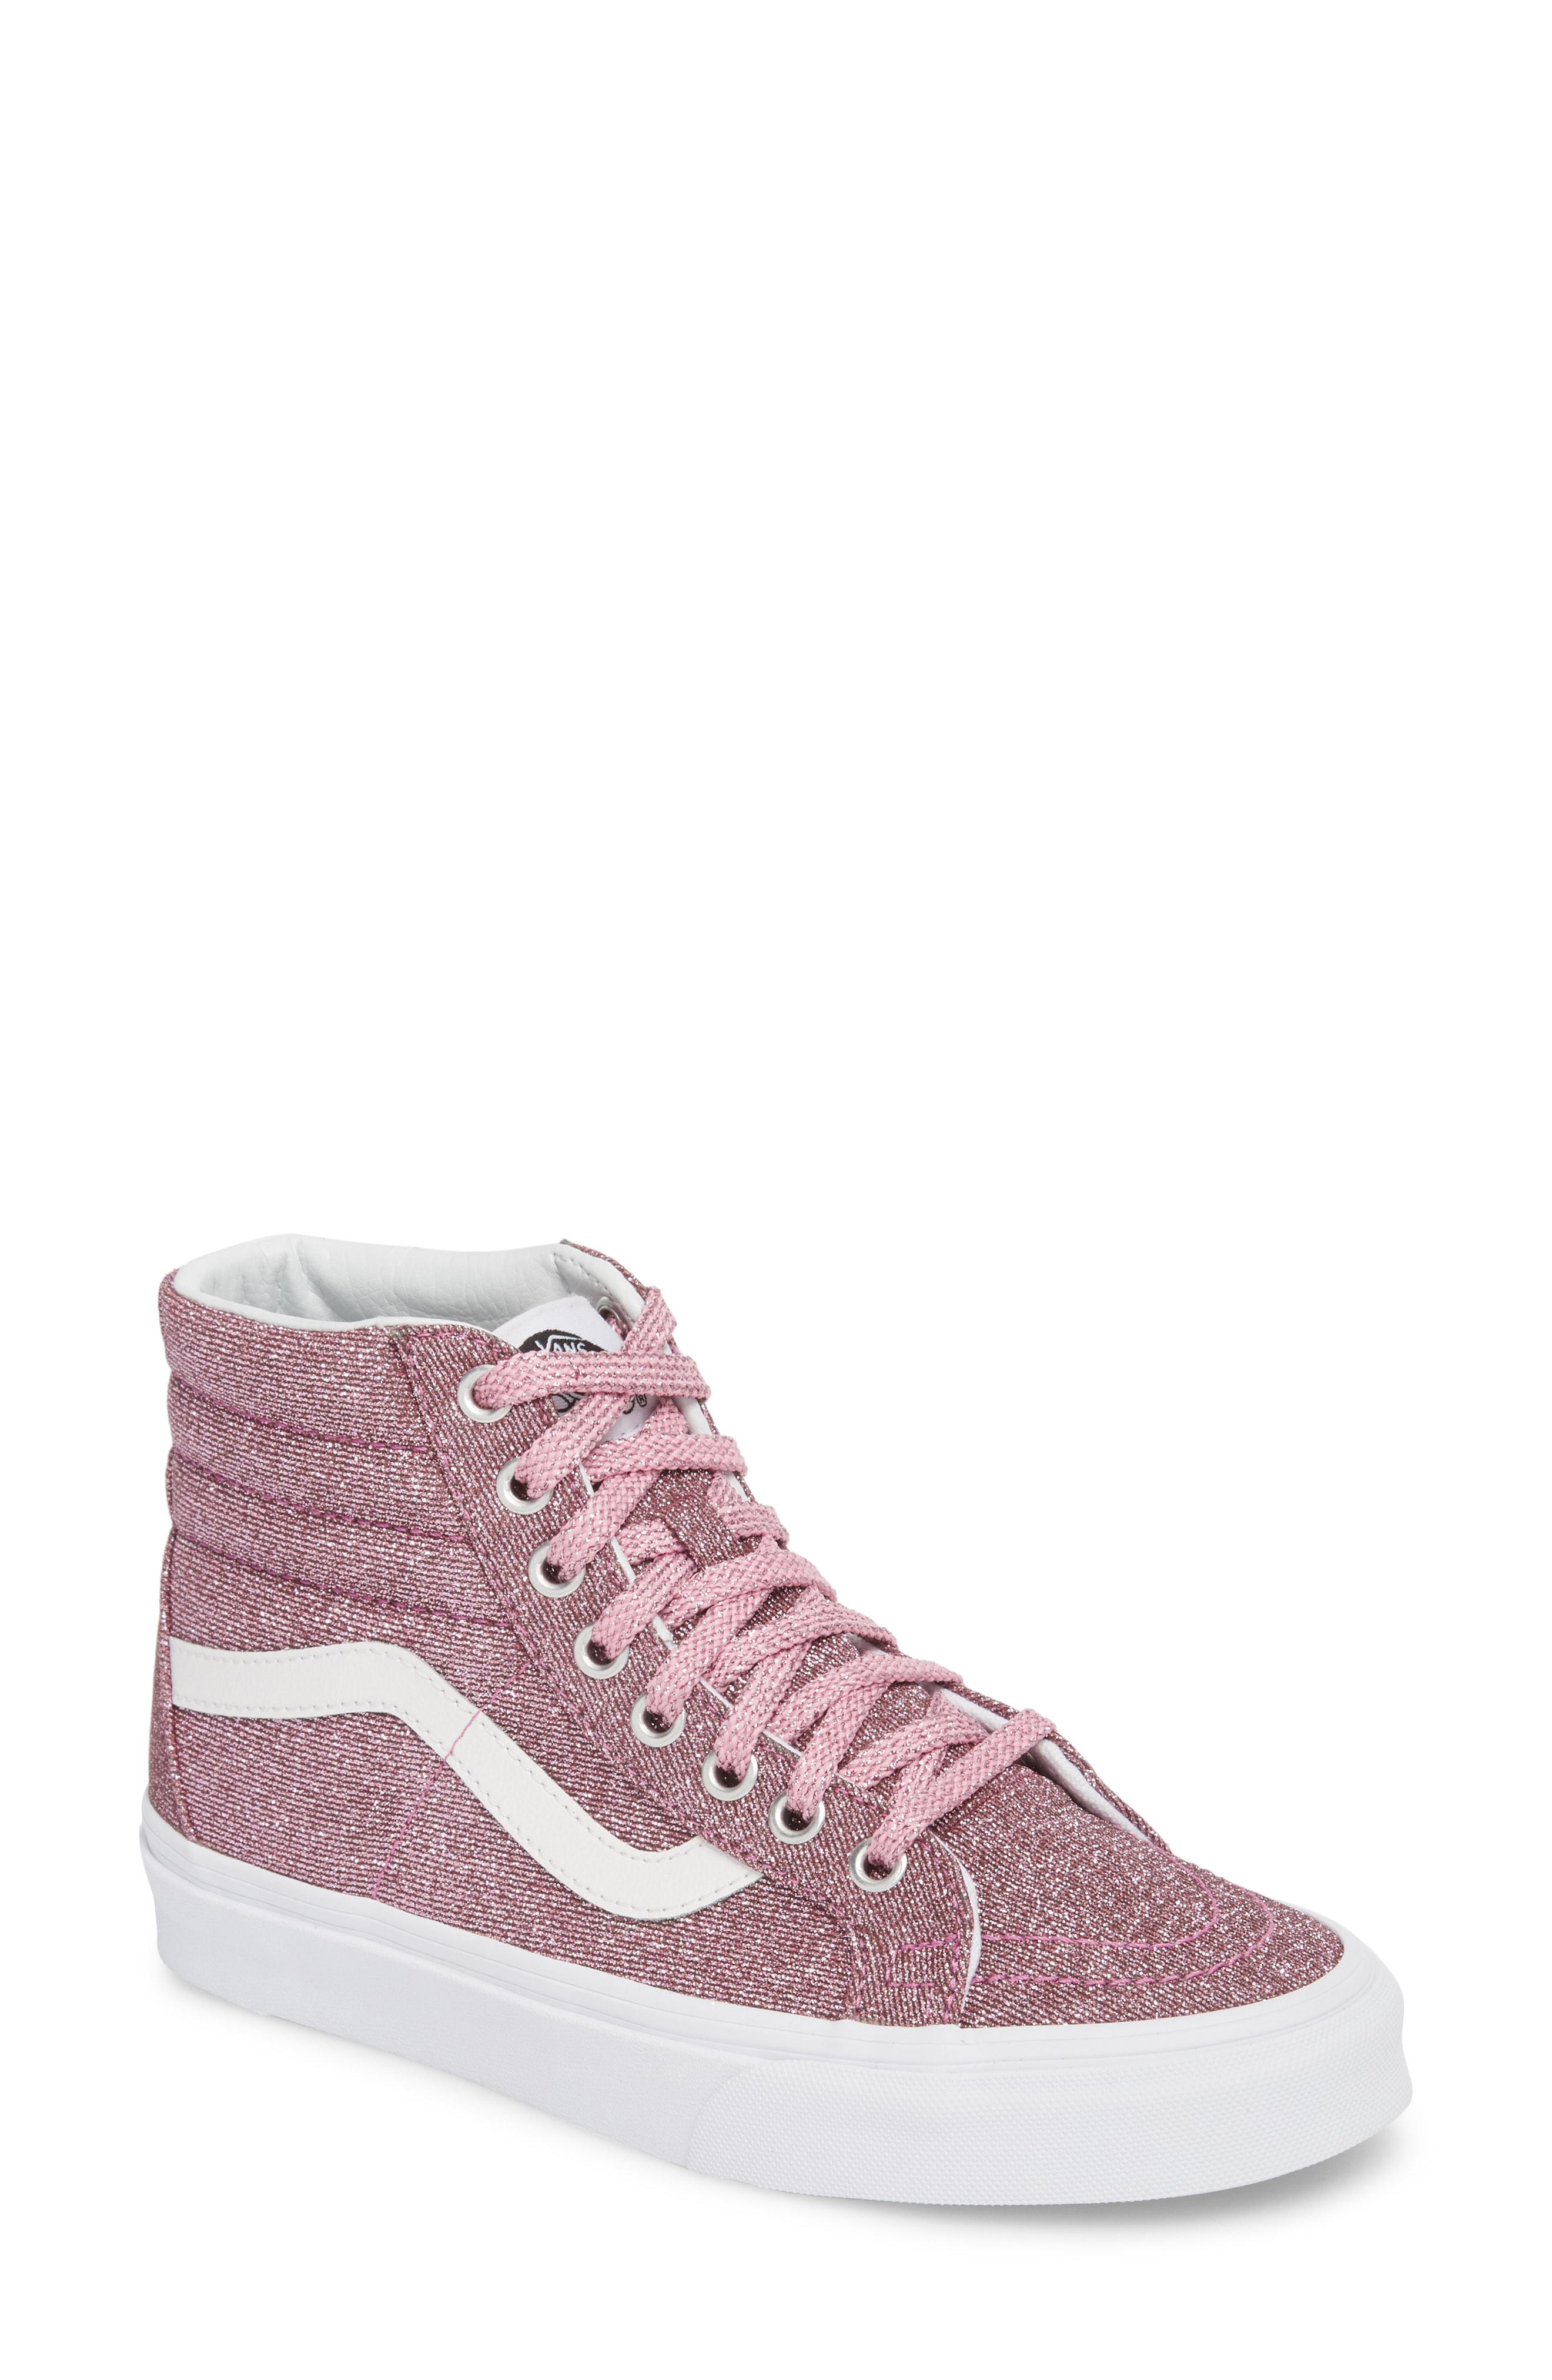 6edeacdaf5 Lyst - Vans Ua Sk8-hi Reissue Glitter Sneaker in Pink